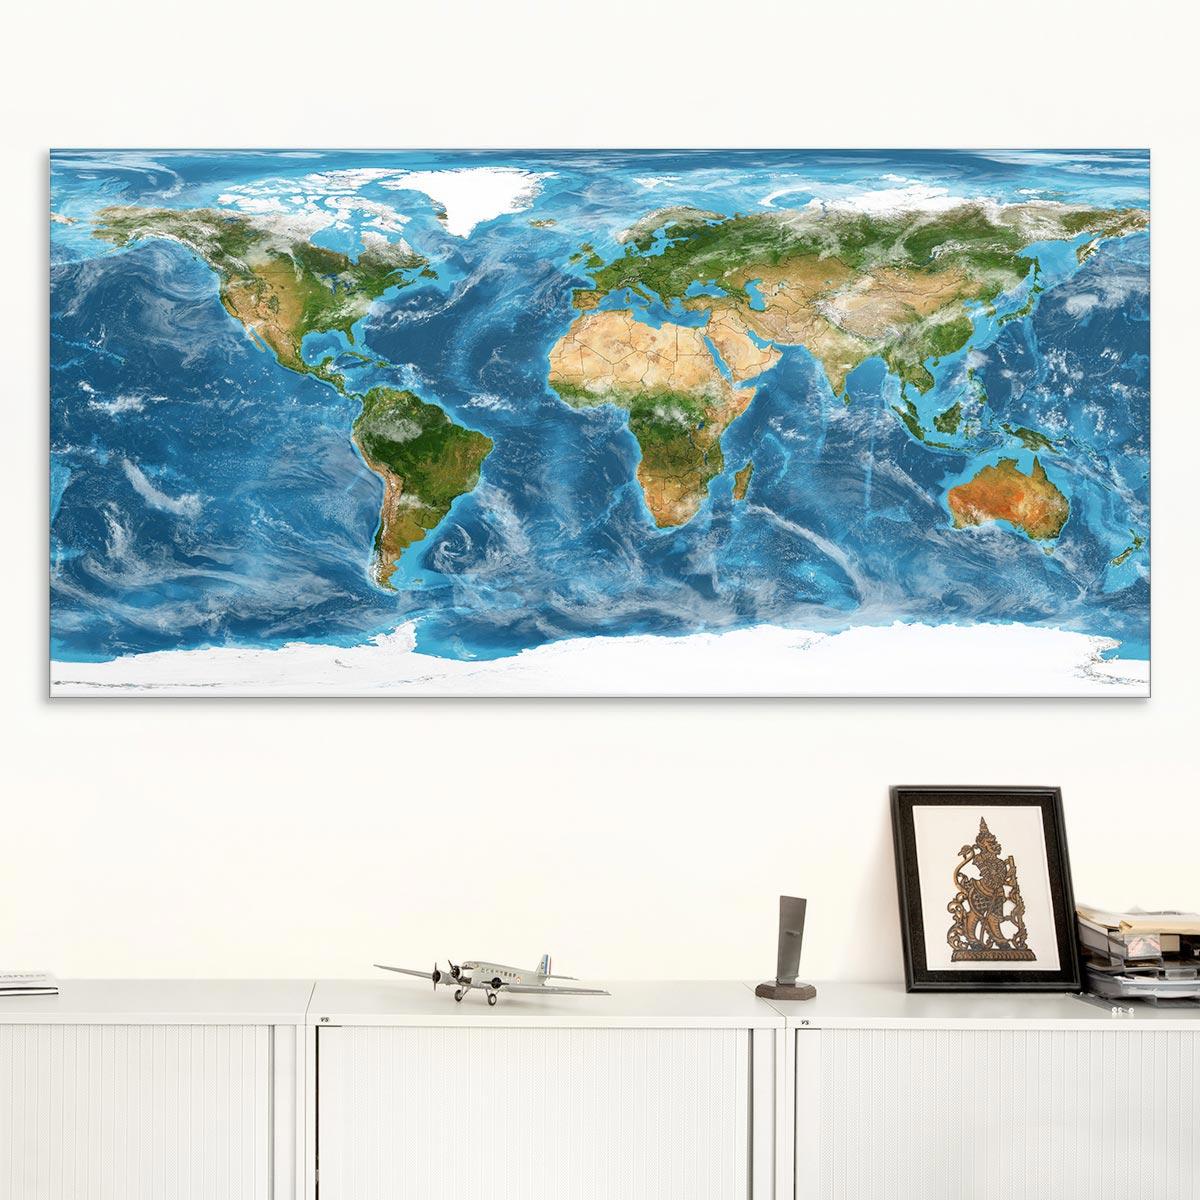 Akustikbild Weltkarte, einseitig, Wandmontage